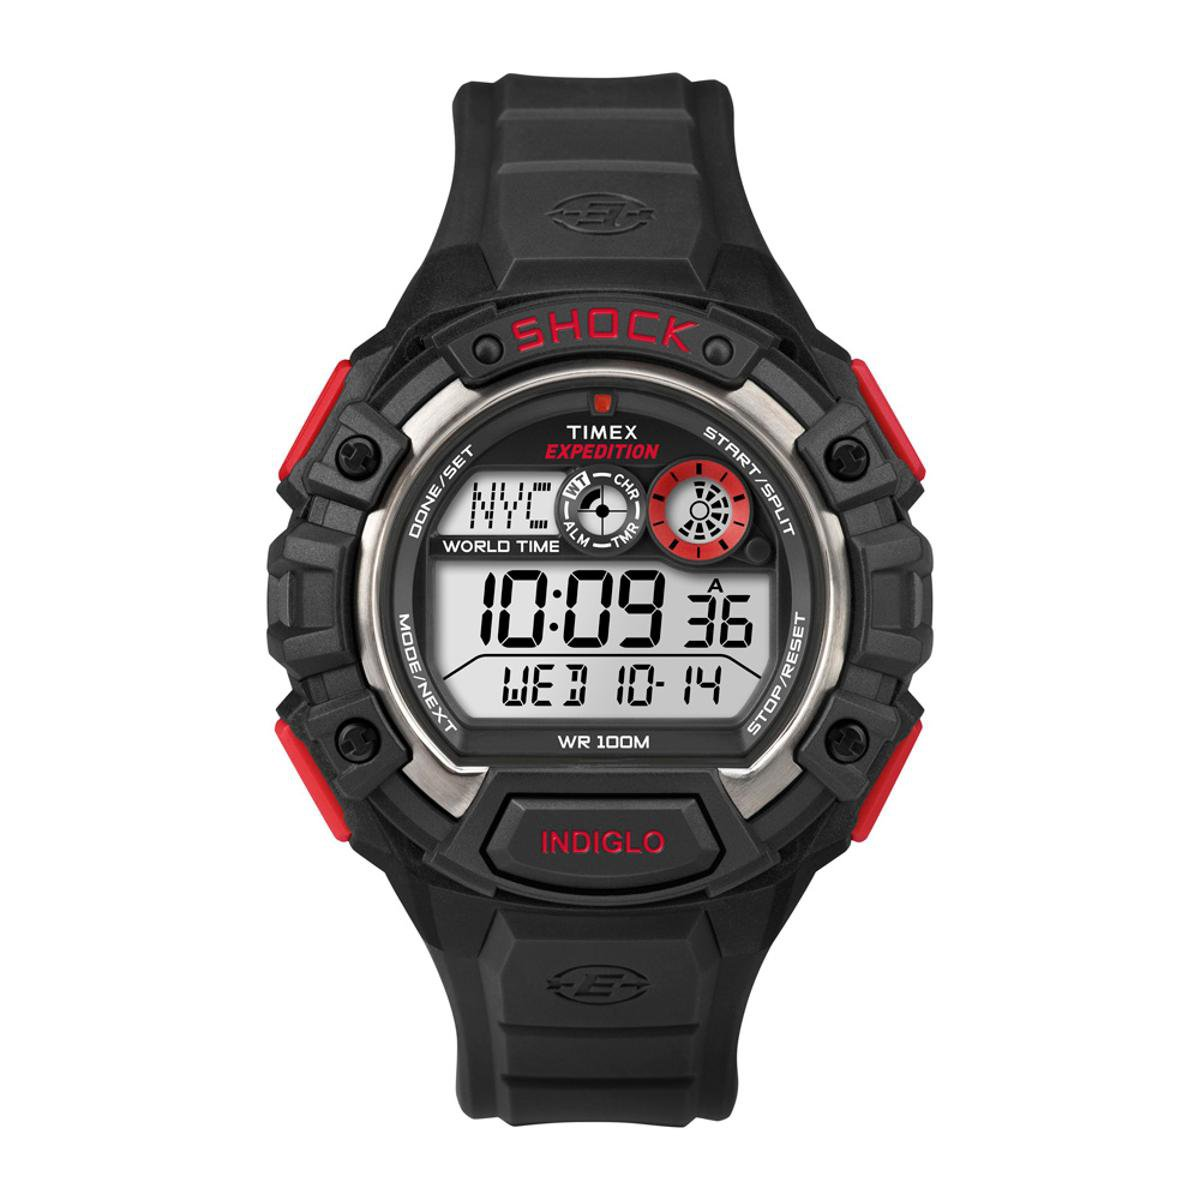 04fb9f41515 Relógio Timex Expedition Masculino - T49973WW TN T49973WW TN - Compre Agora